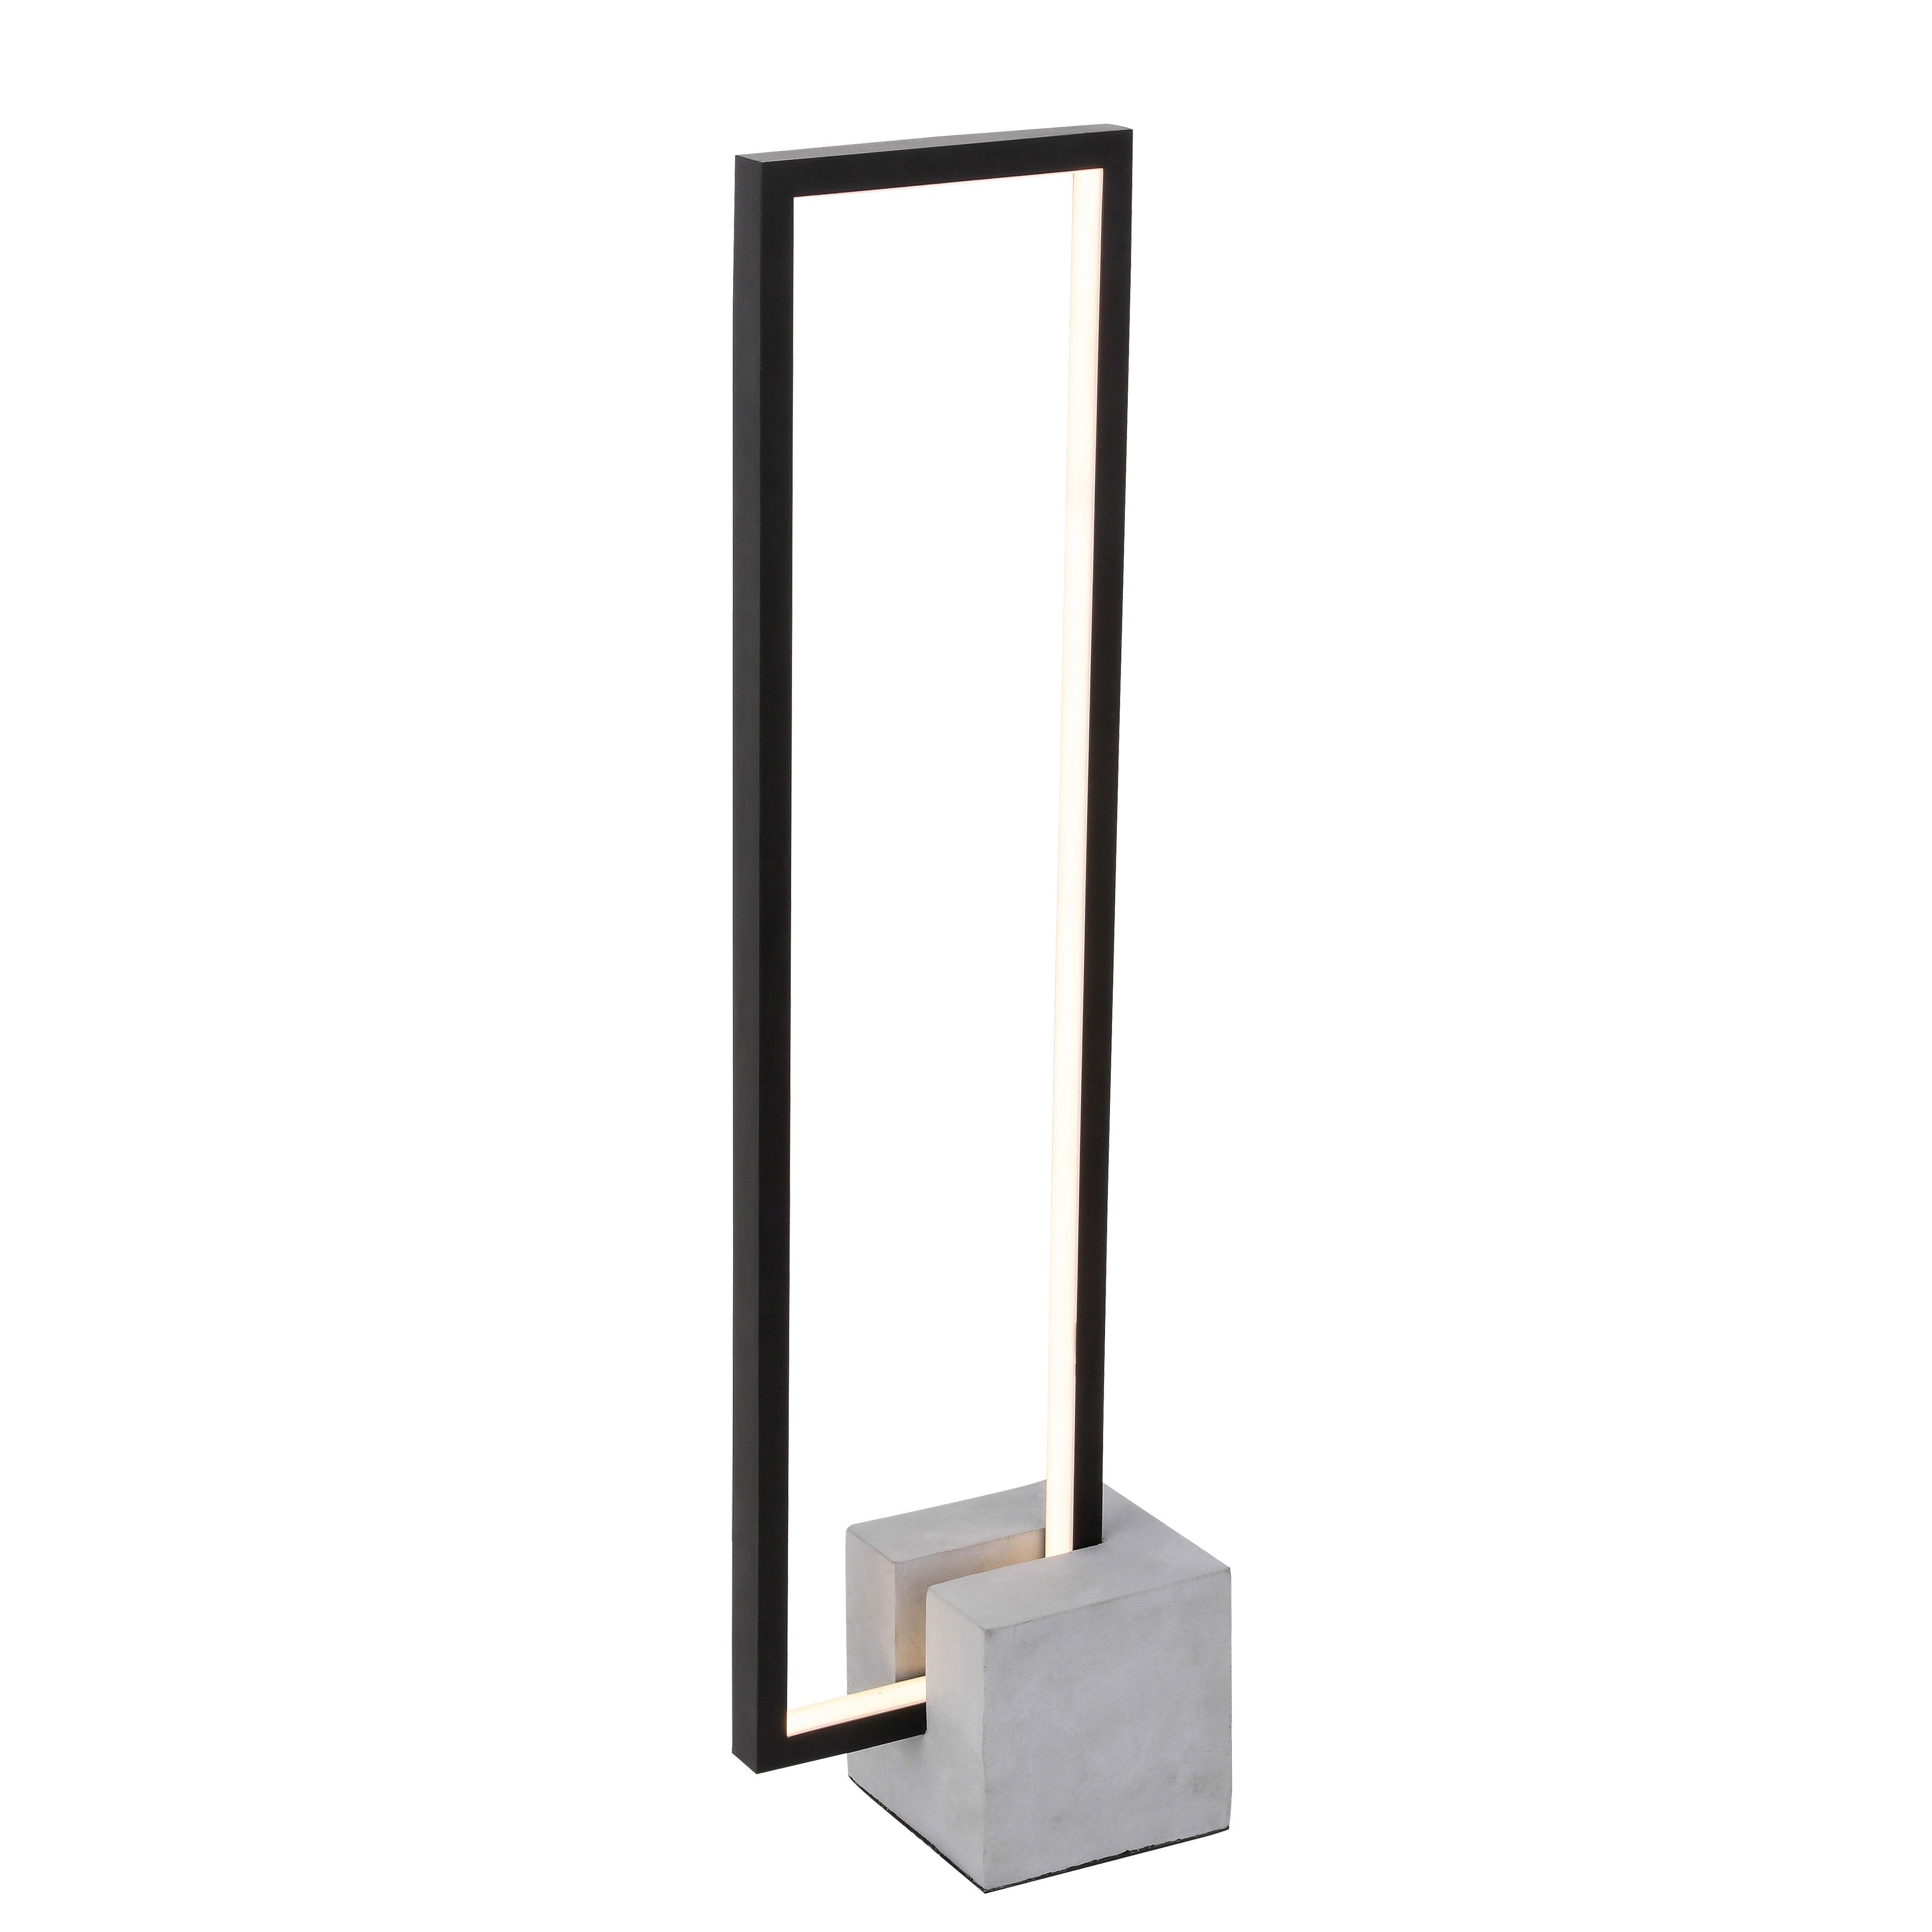 21.6W LED Table Lamp Black Finish with Concrete Base